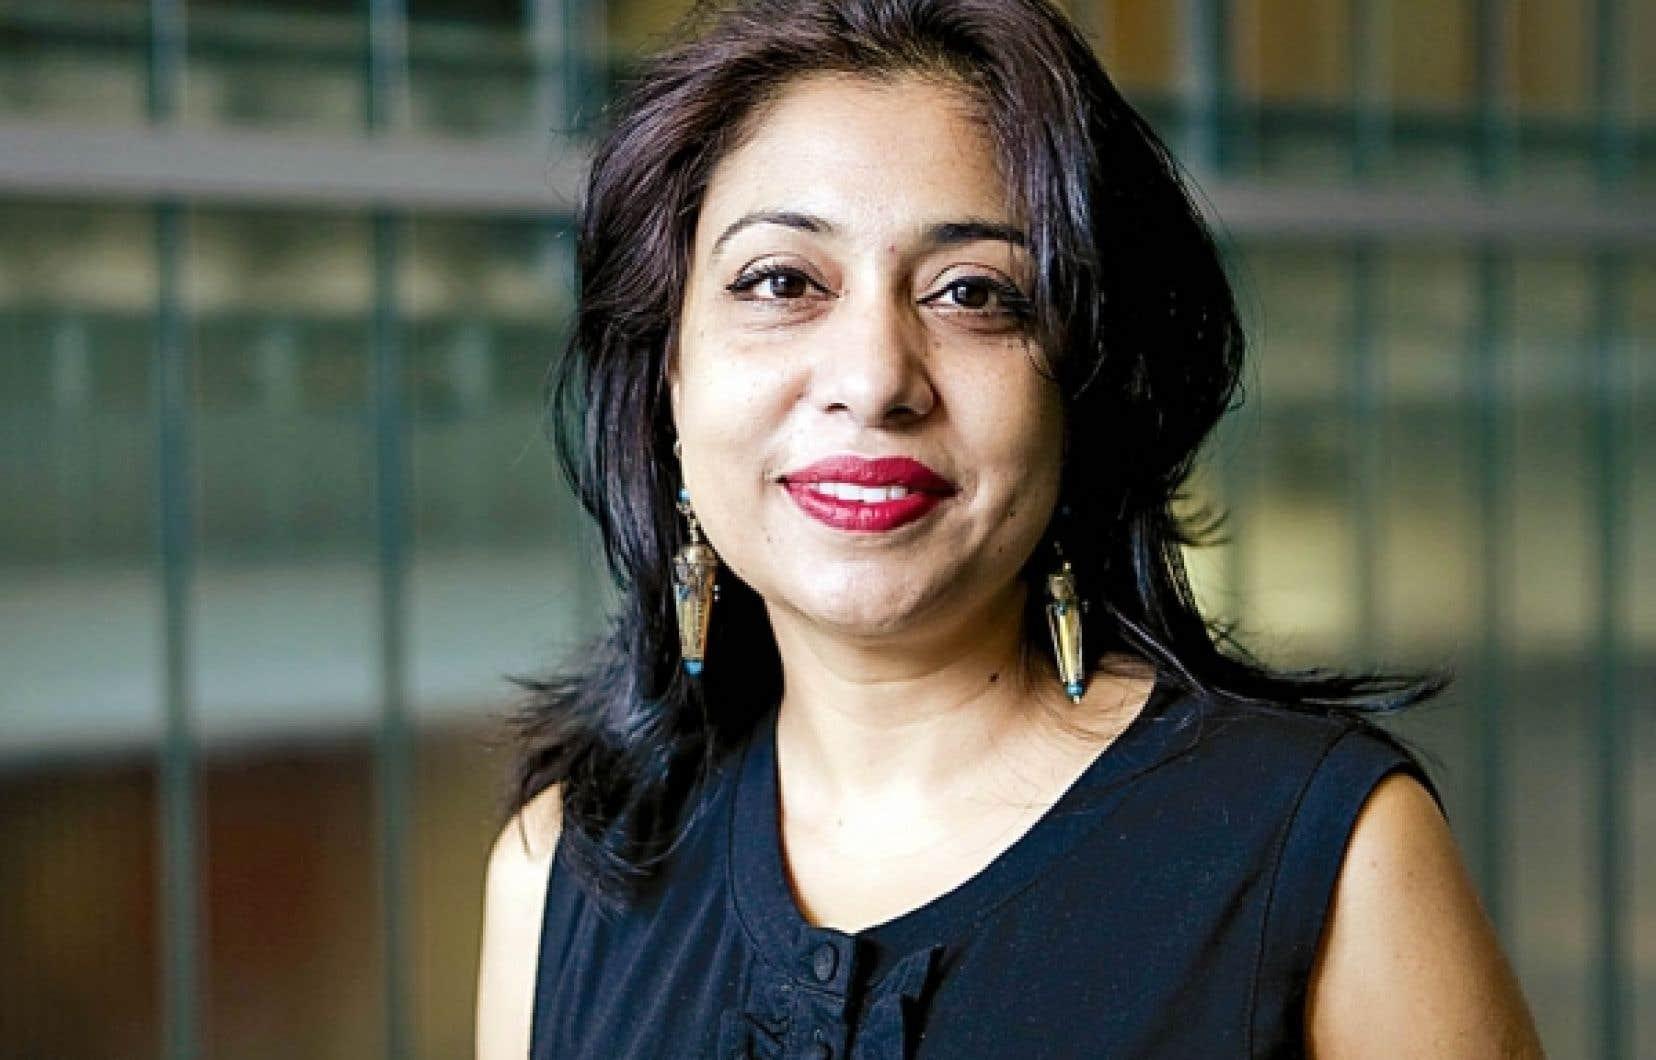 La professeure Adeela Arshad-Ayaz, théoricienne critique du postcolonialisme